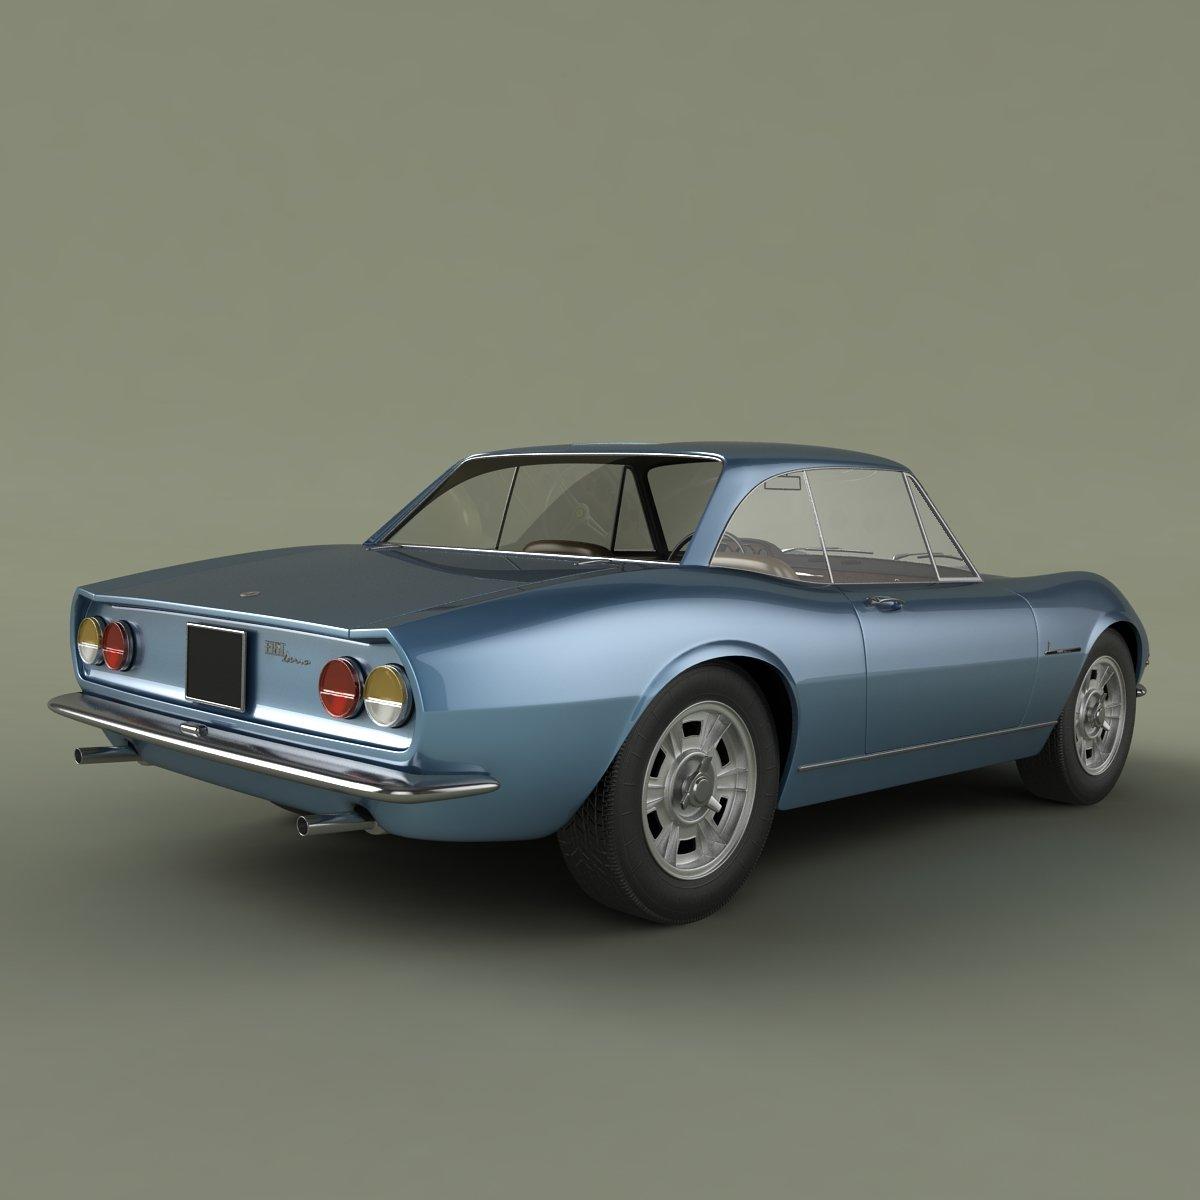 Fiat Dino Coupe Speciale Prototipo 3d Model In Classic Cars 3dexport